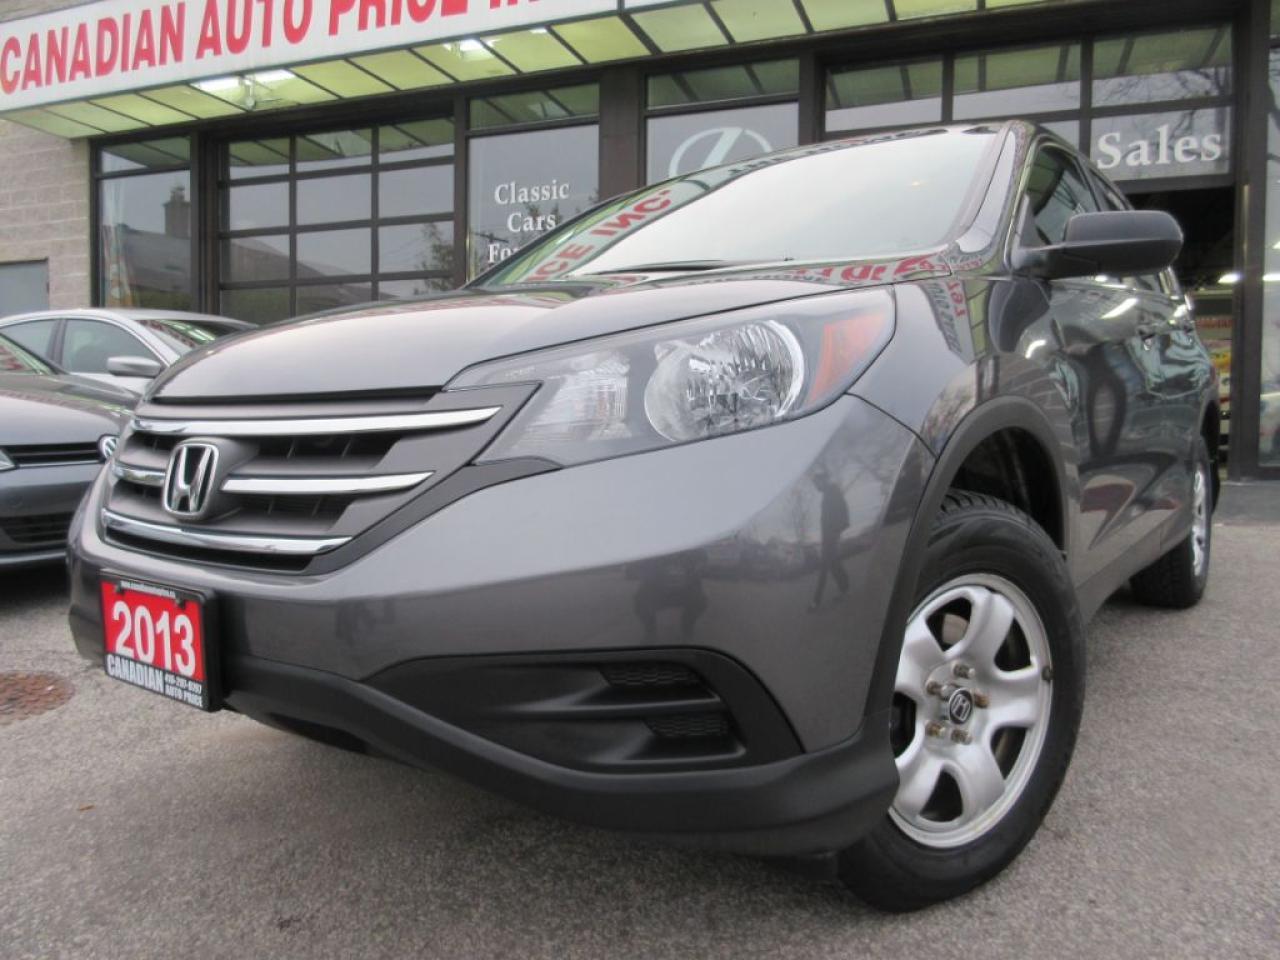 2013 Honda CR-V LX-AWD-CAMERA-BLUETOOTH CONNECTIVITY- HEATED